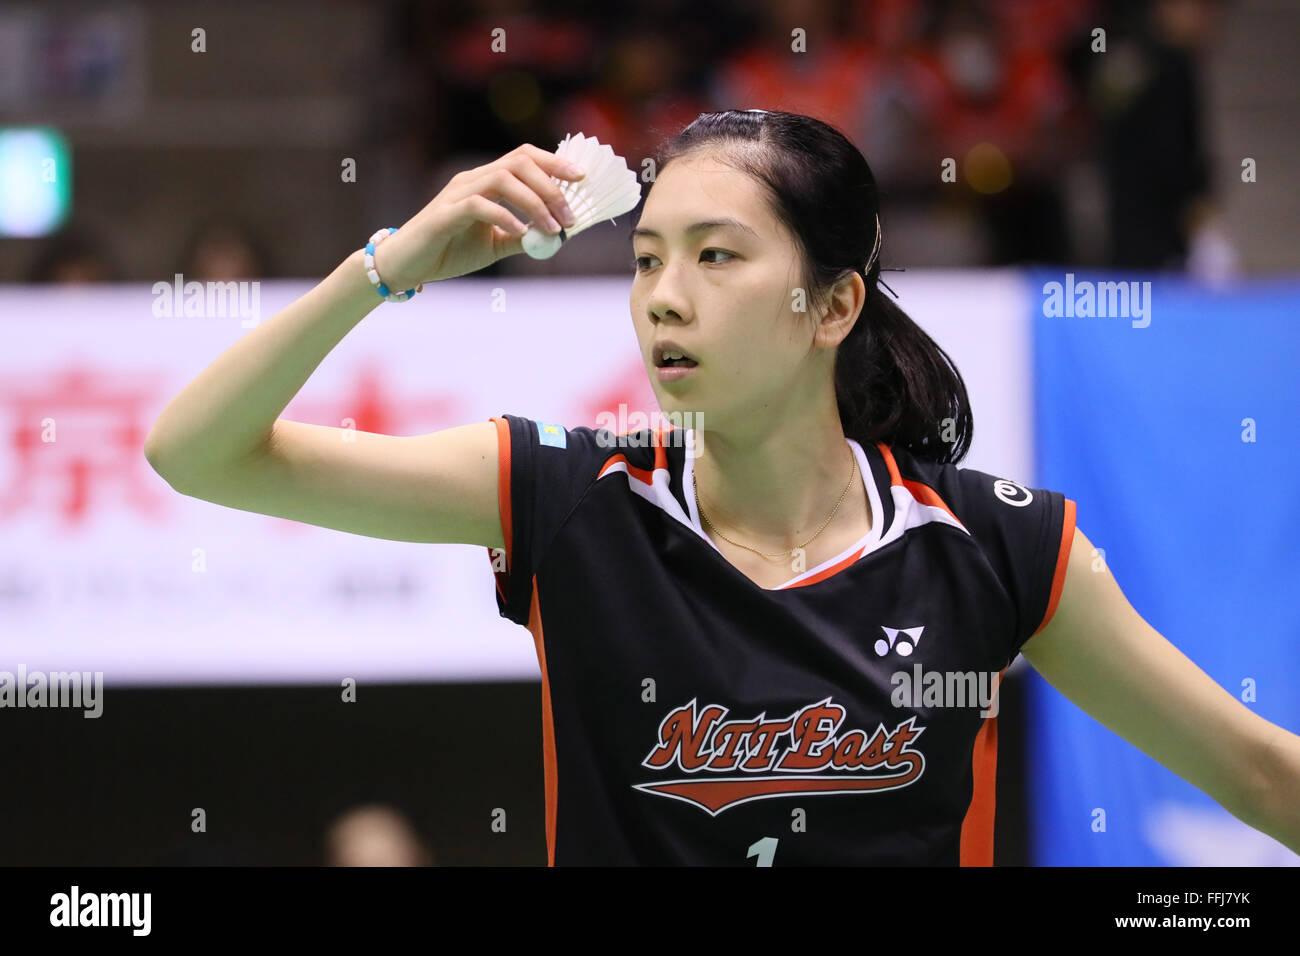 nd Yoyogi Gymnasium Tokyo Japan 14th Feb 2016 Aya Ohori Stock